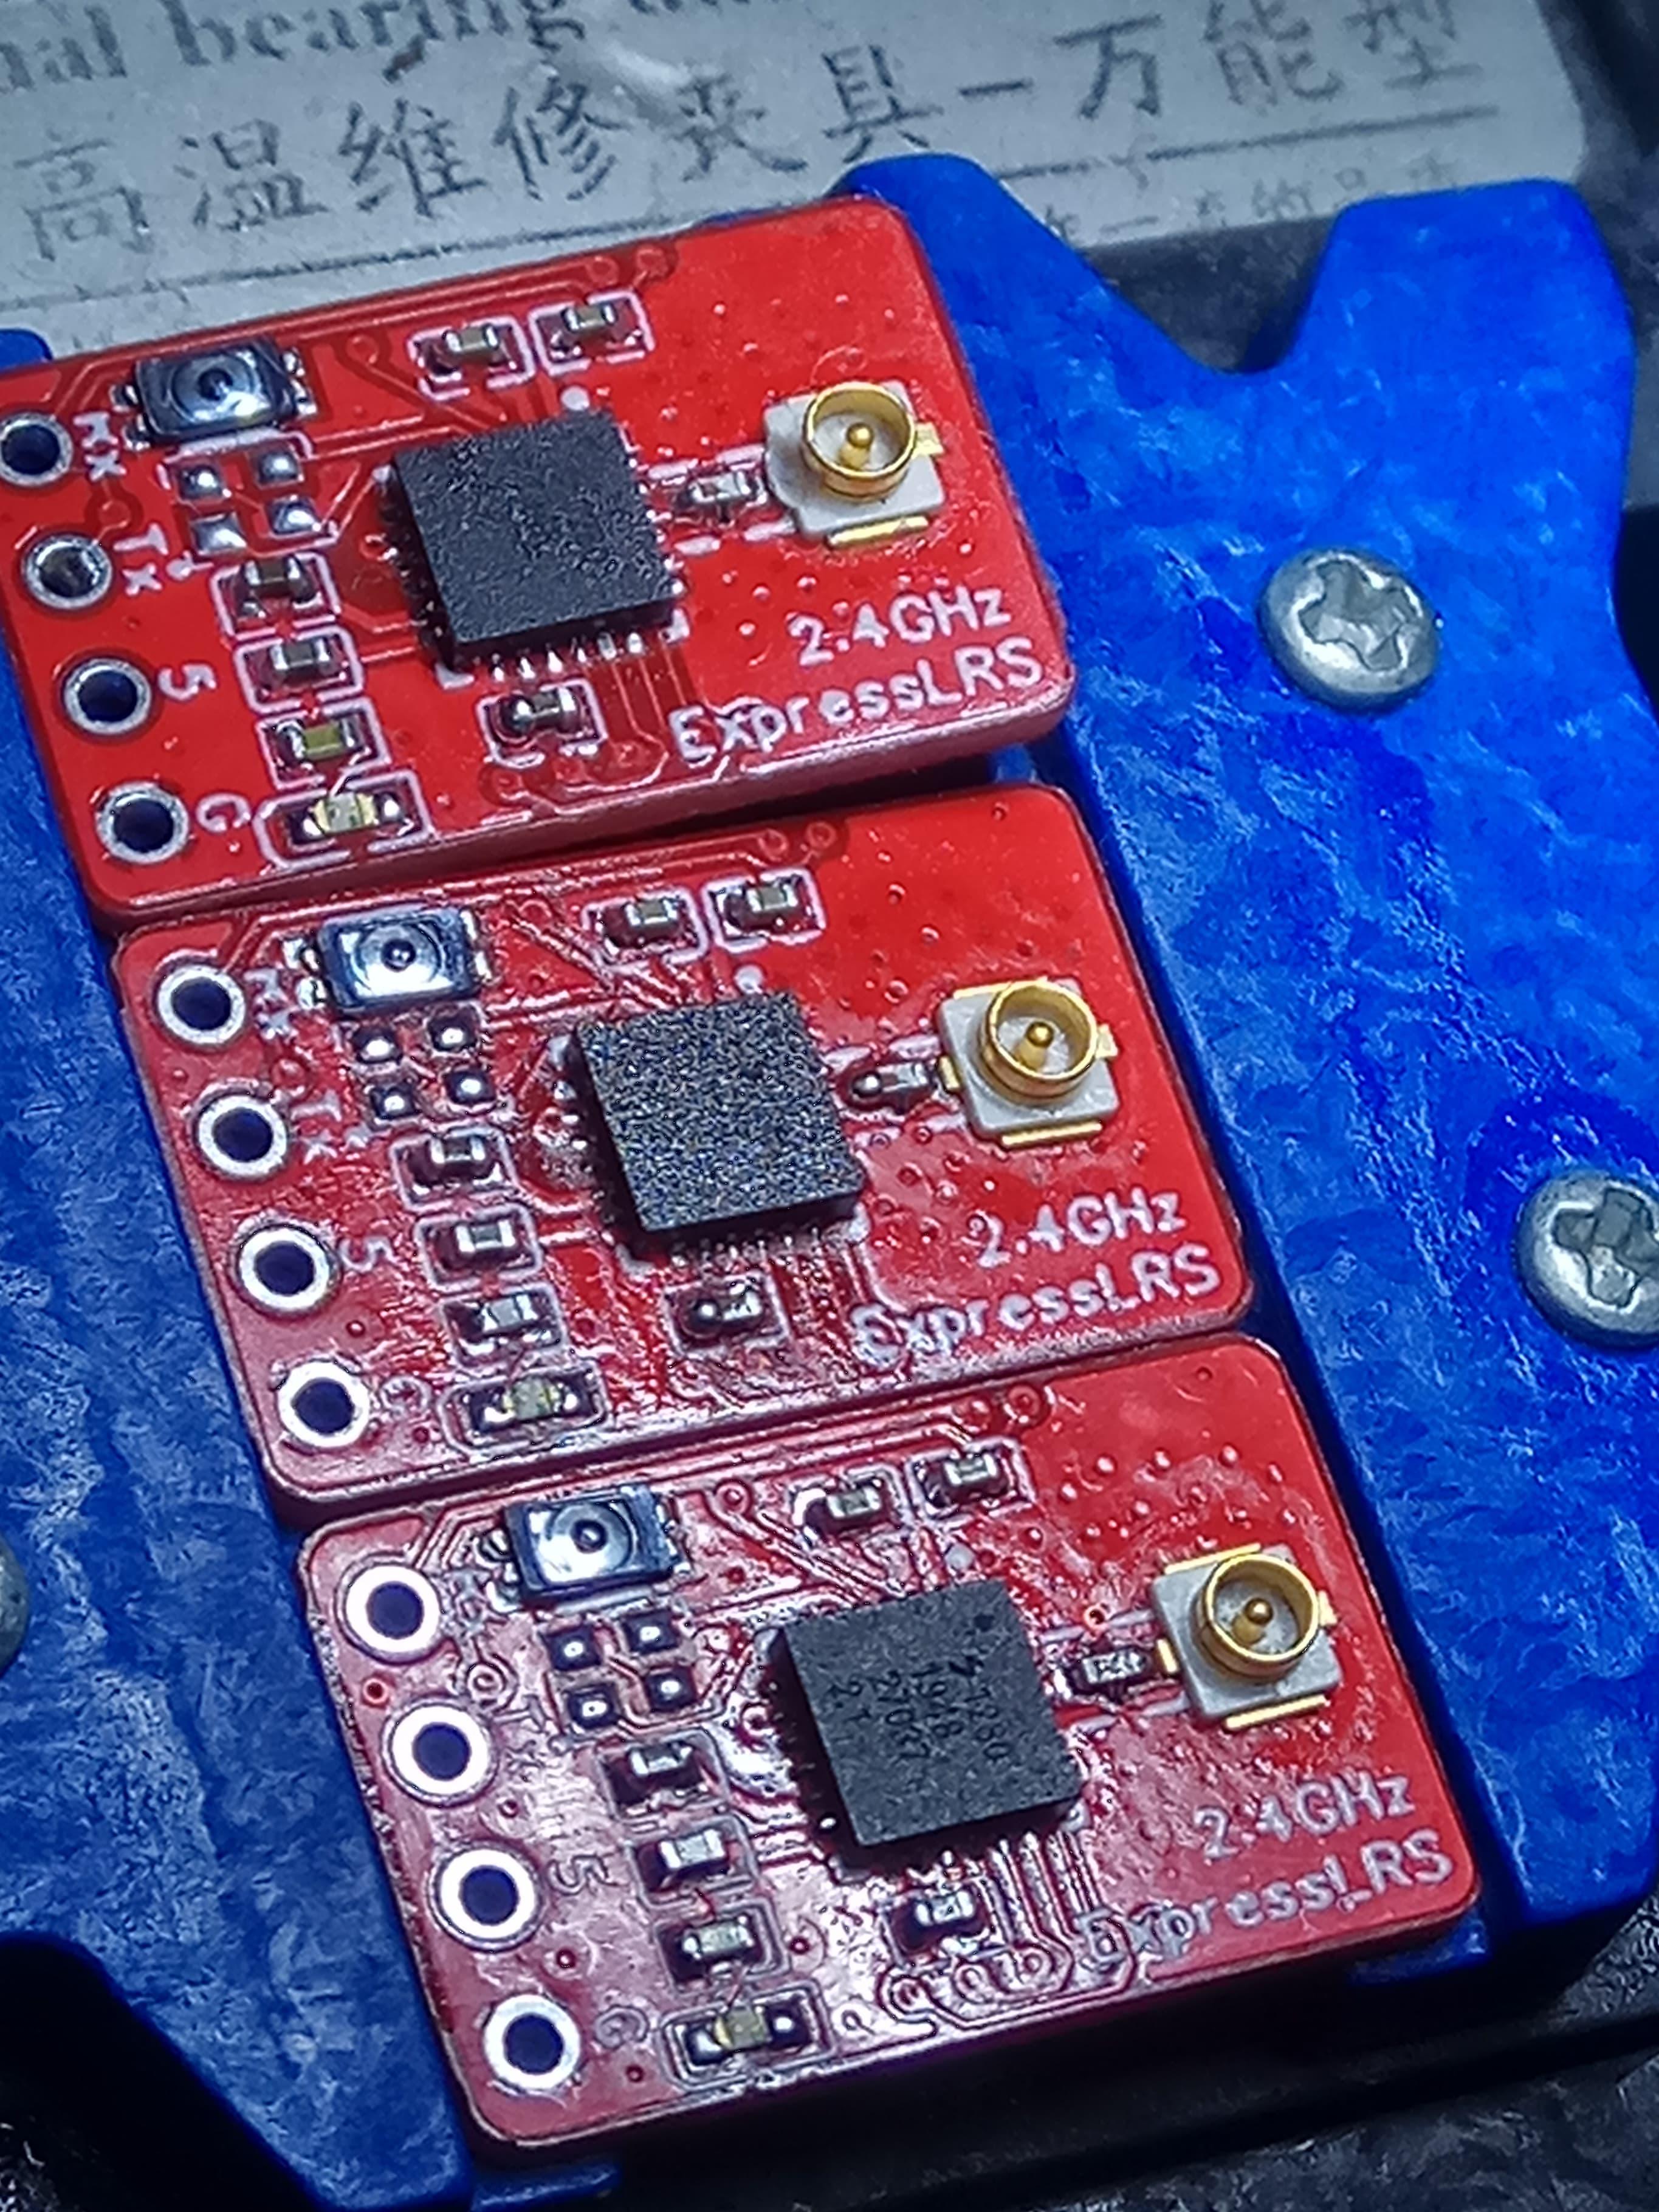 2.4 GHz Nano